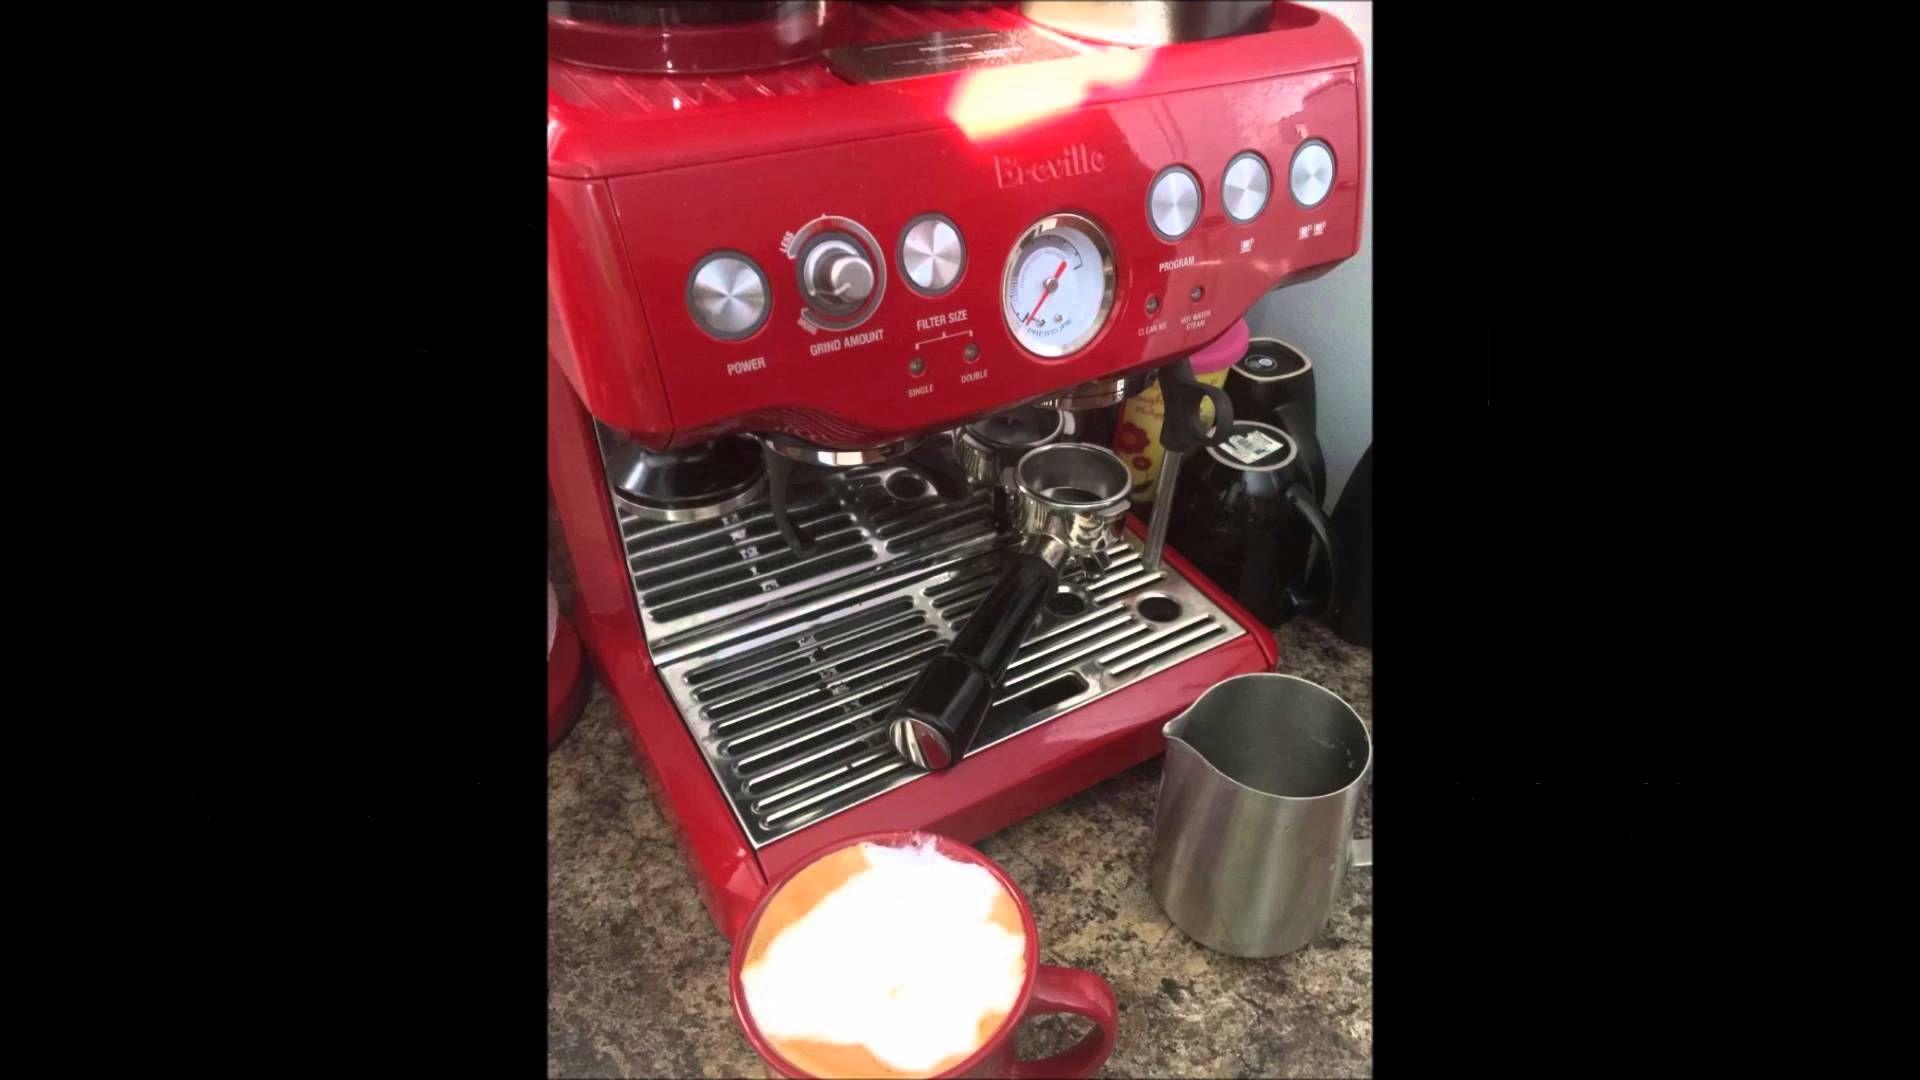 Breville Bes870xl Barista Express Espresso Machine Review Breville Espresso Machine Espresso Machine Reviews Espresso